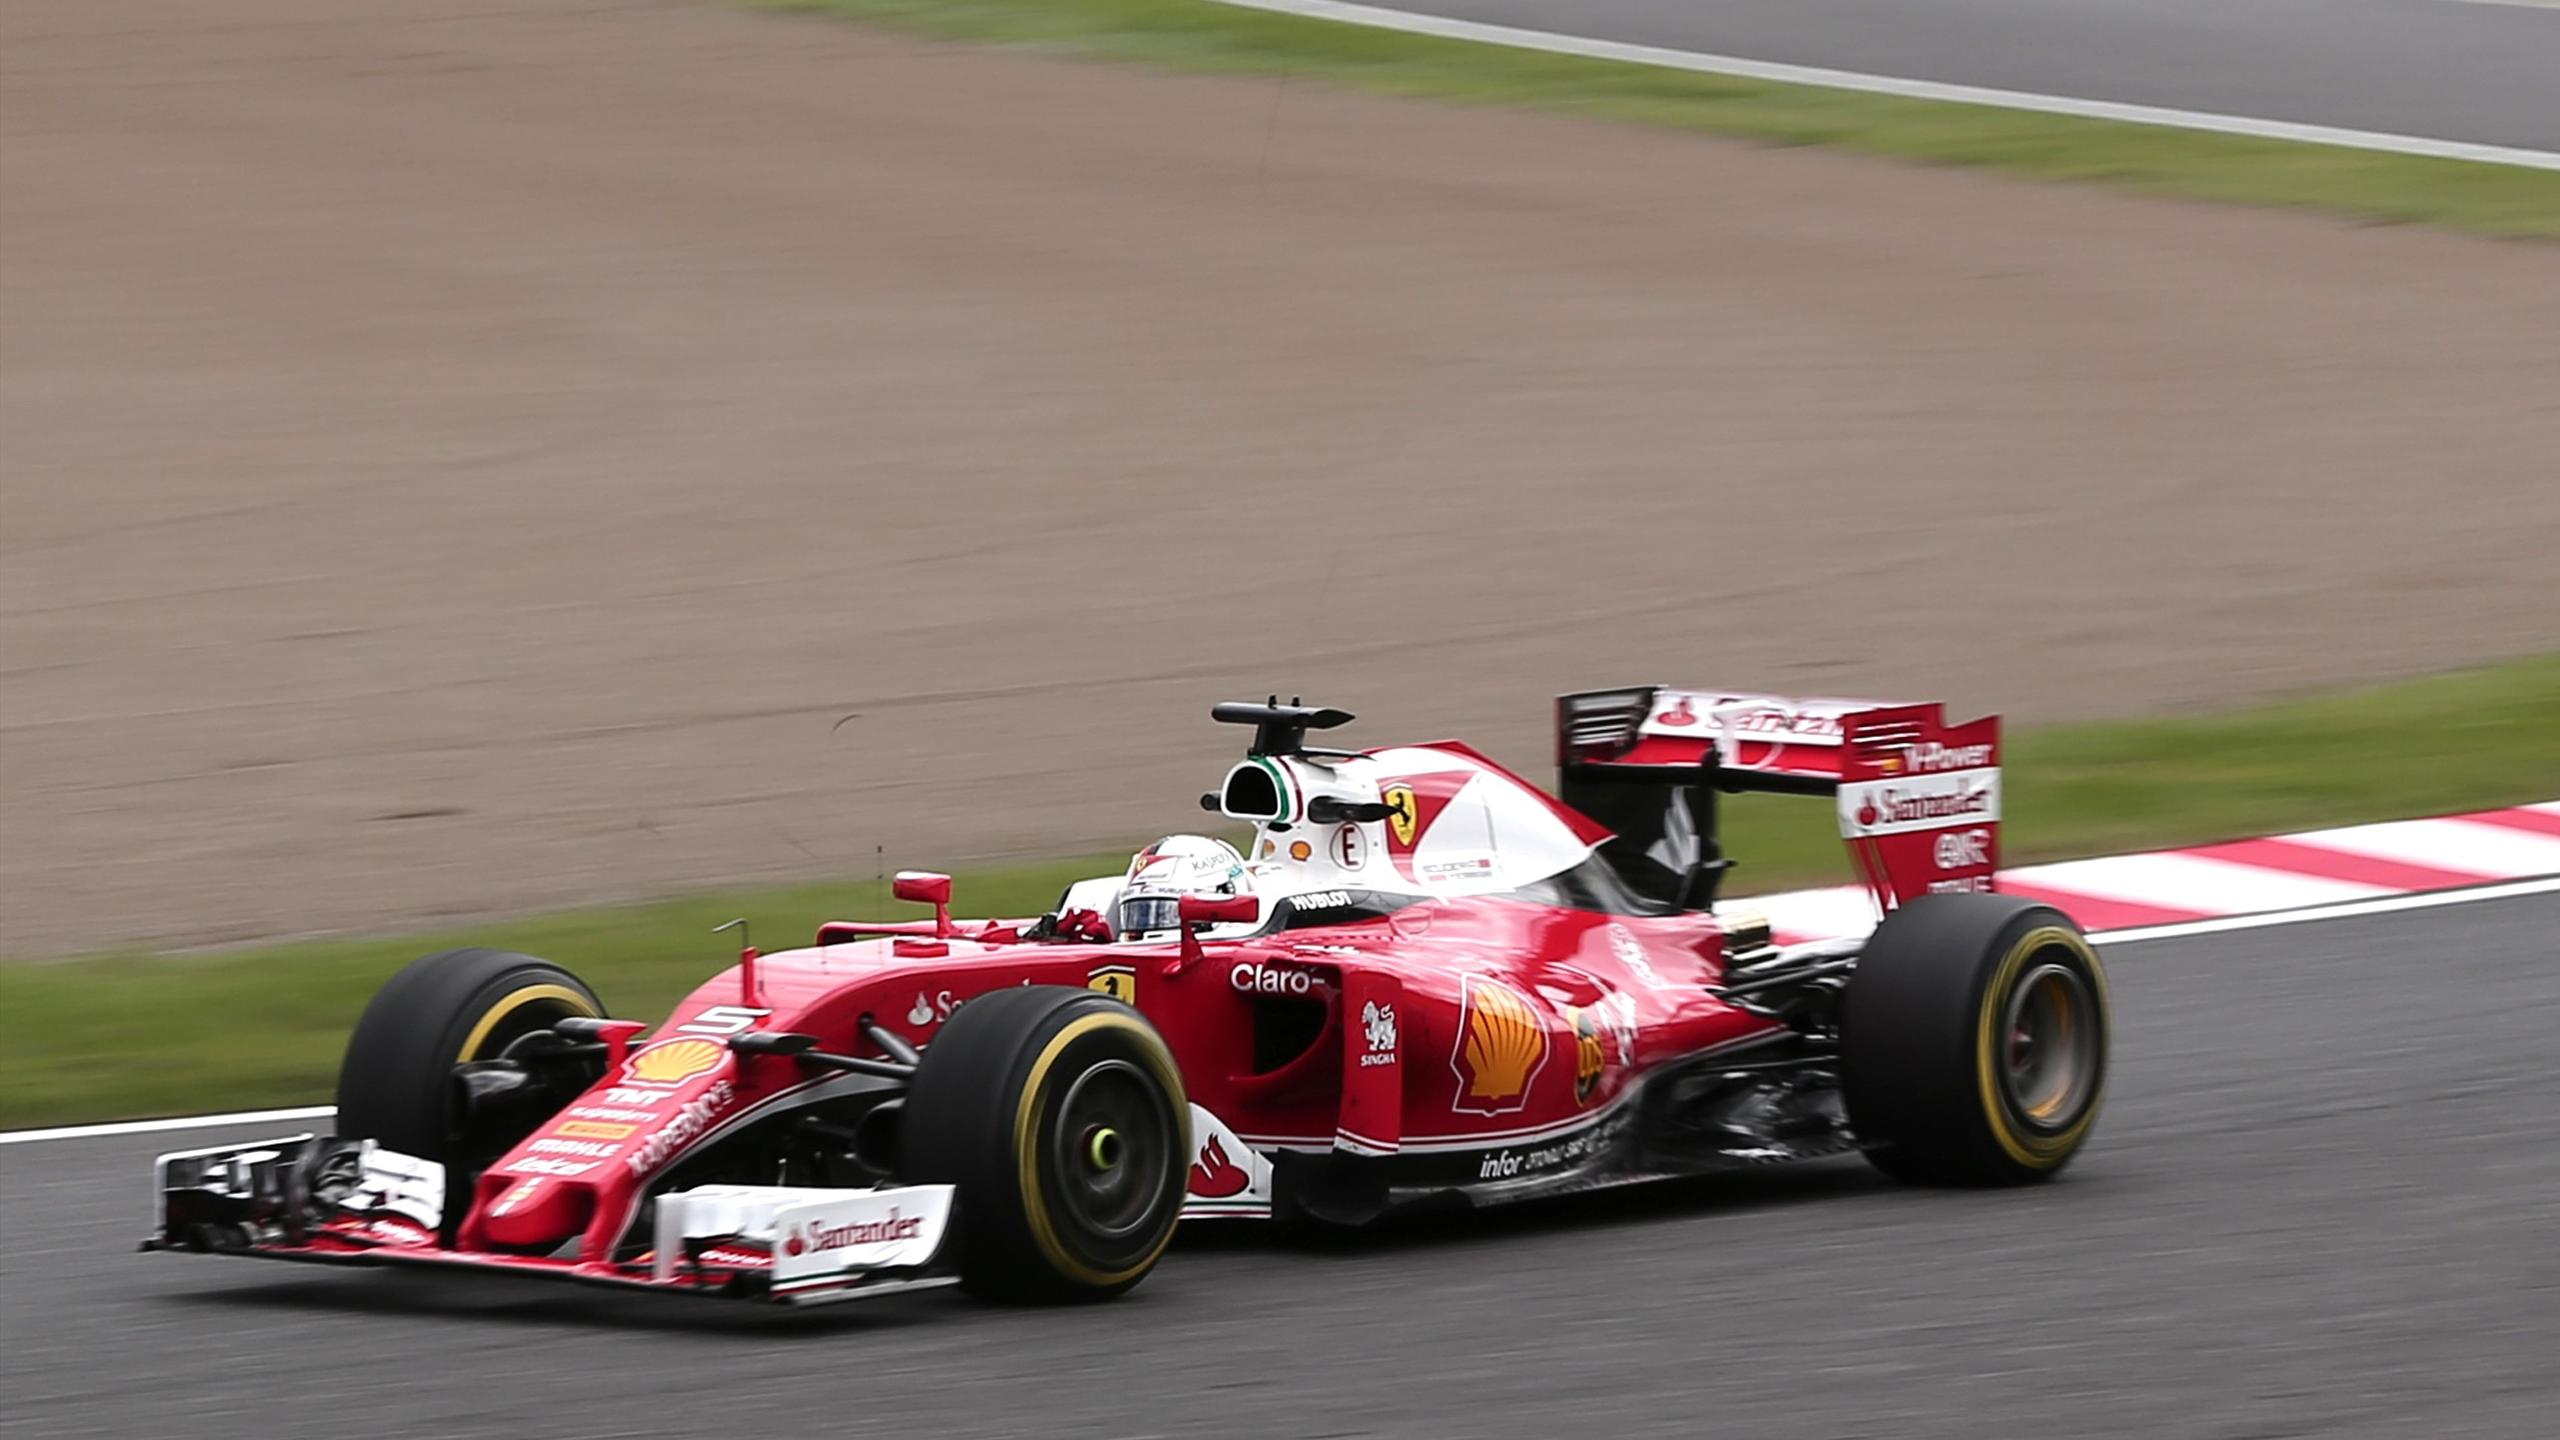 Sebastian Vettel (Ferrari) au Grand Prix du Japon 2016